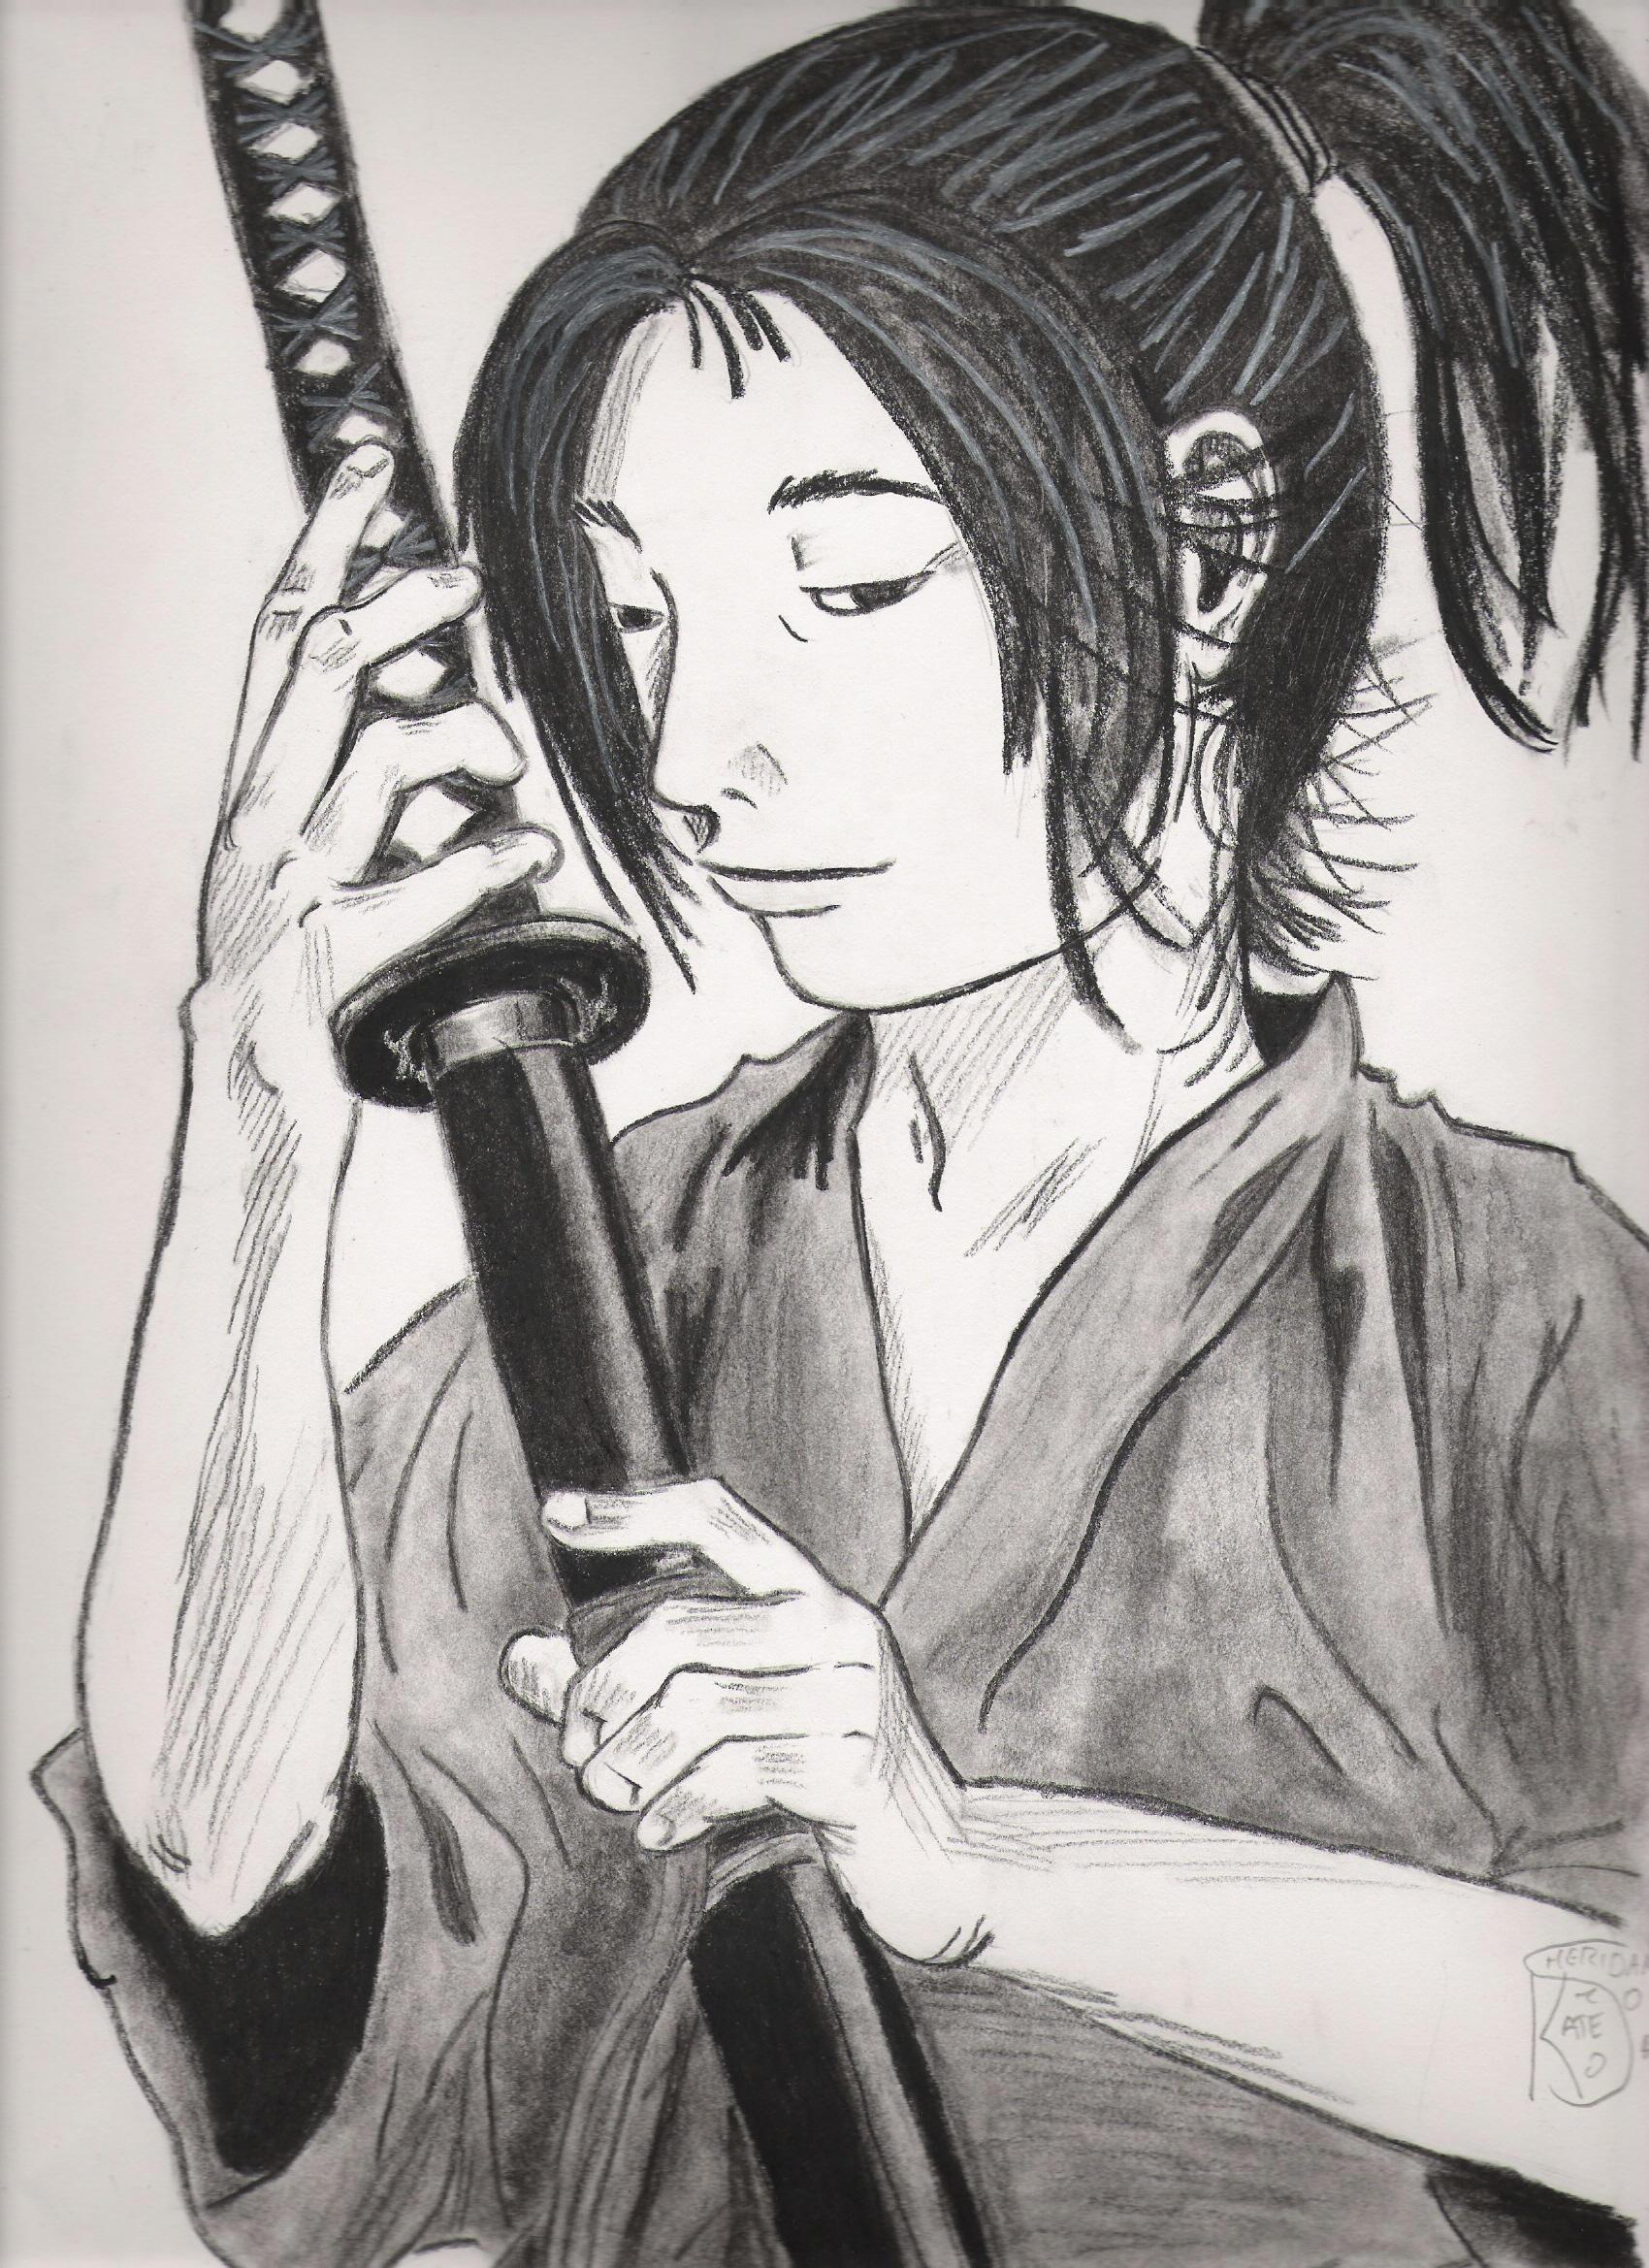 Sasaki Kojiro From Vagabond By Ksheridan